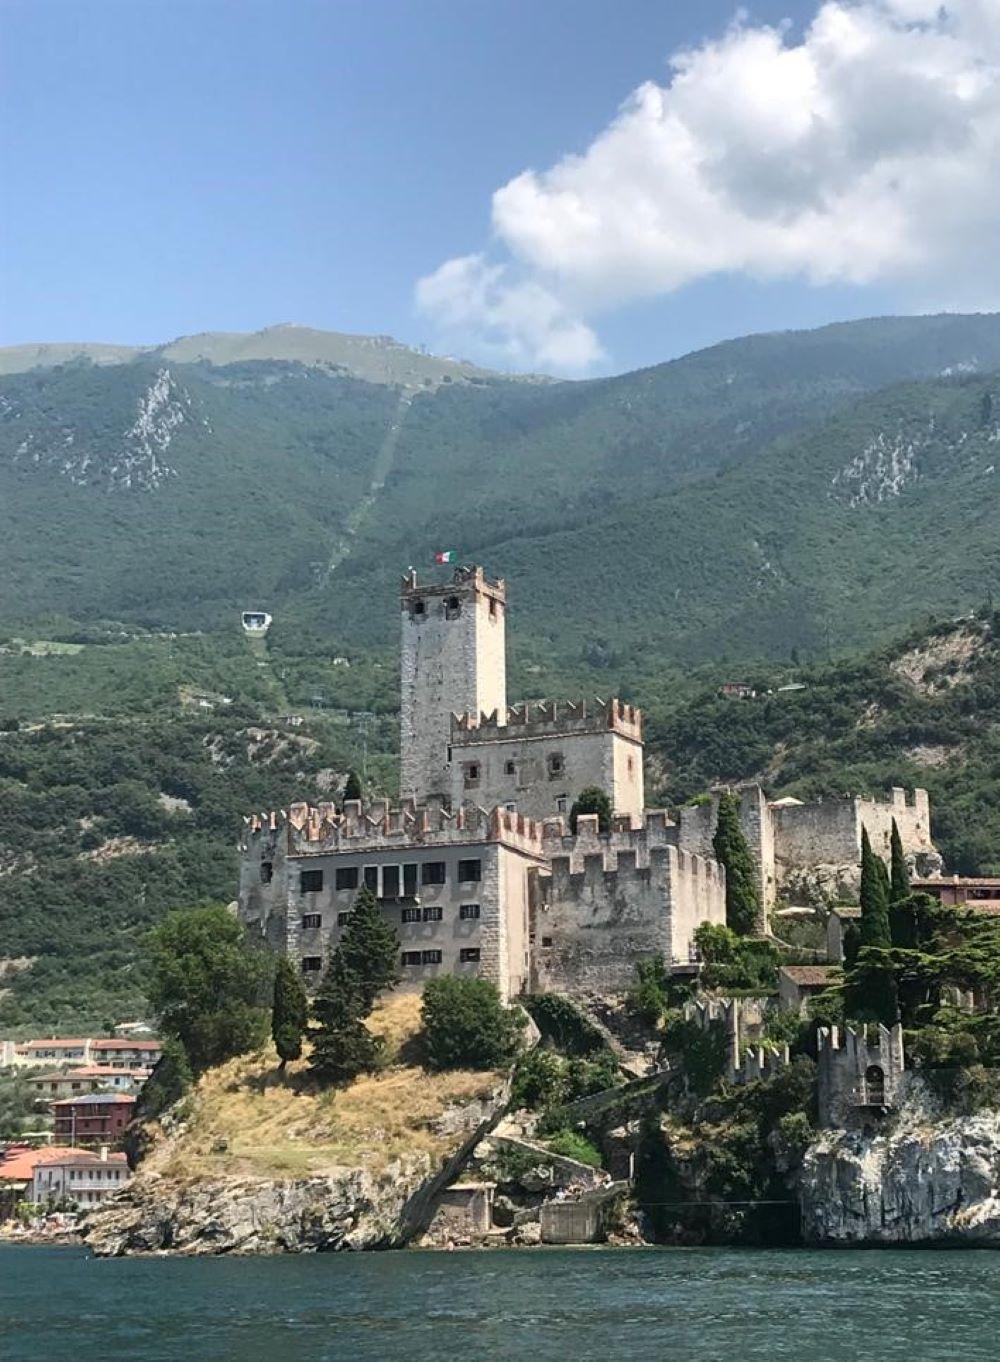 Scaligerburg in Malscesine vor dem Monte Baldo - links neben dem Turm die Seilbahn(Funivia Malcesine)